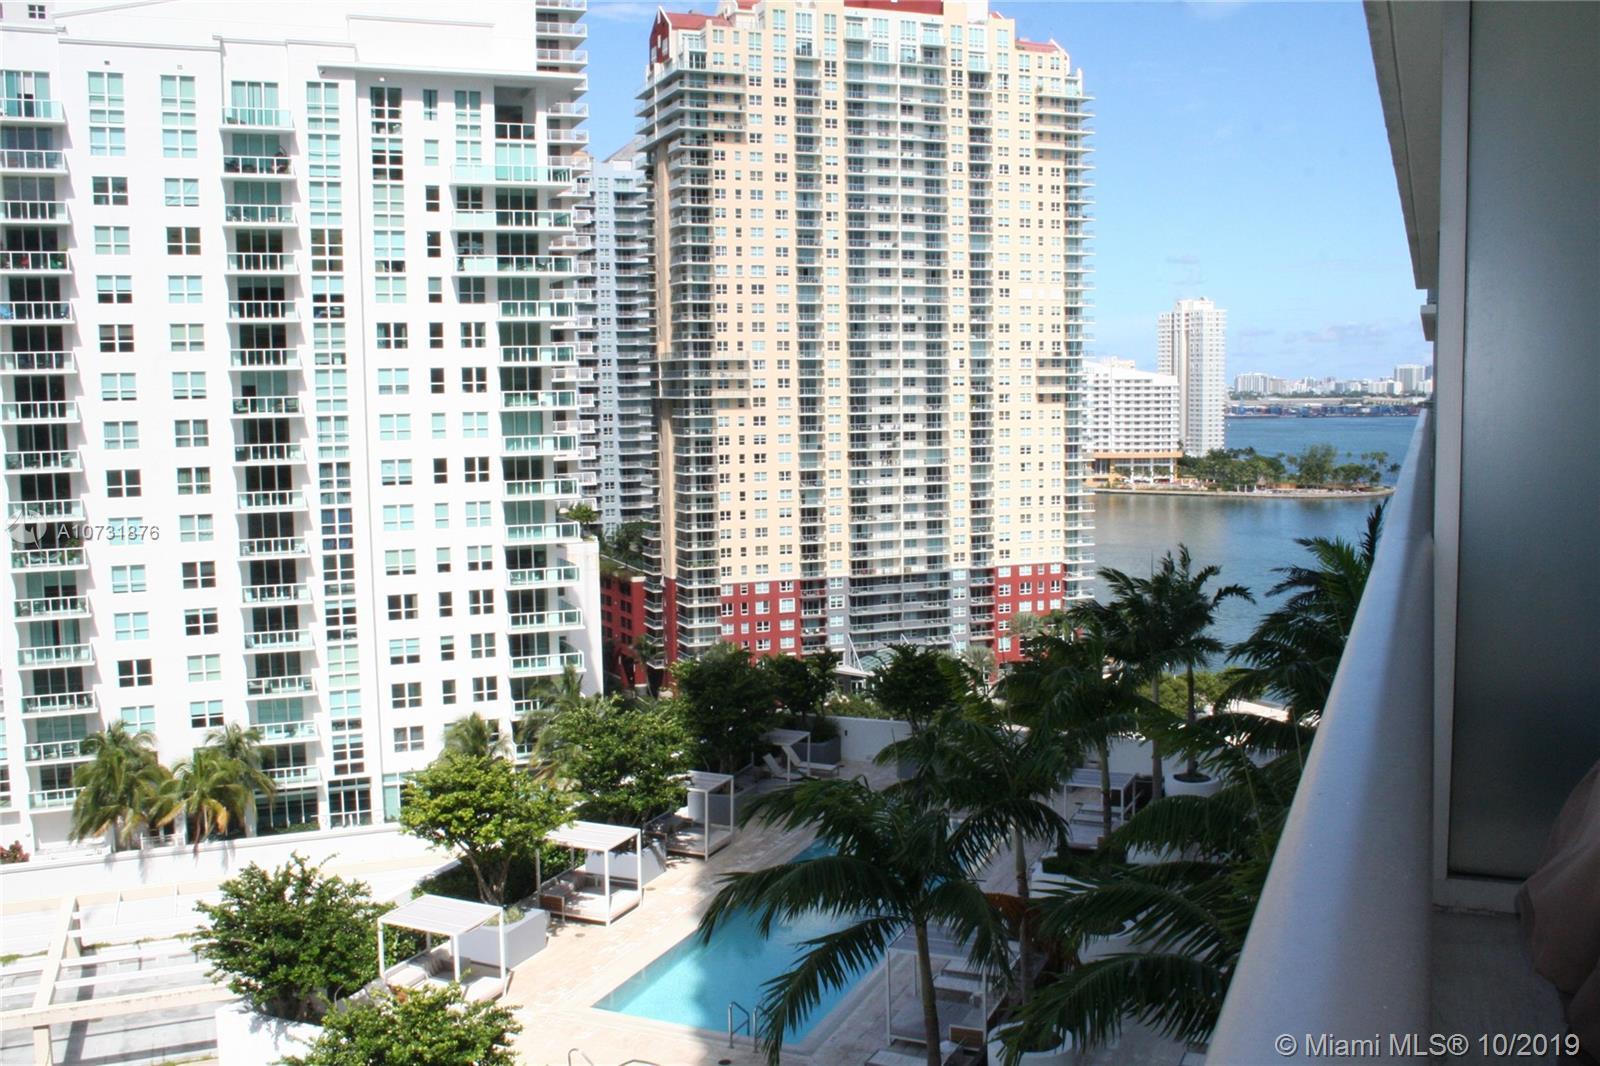 1300 Brickell Bay Dr, 1702 - Miami, Florida